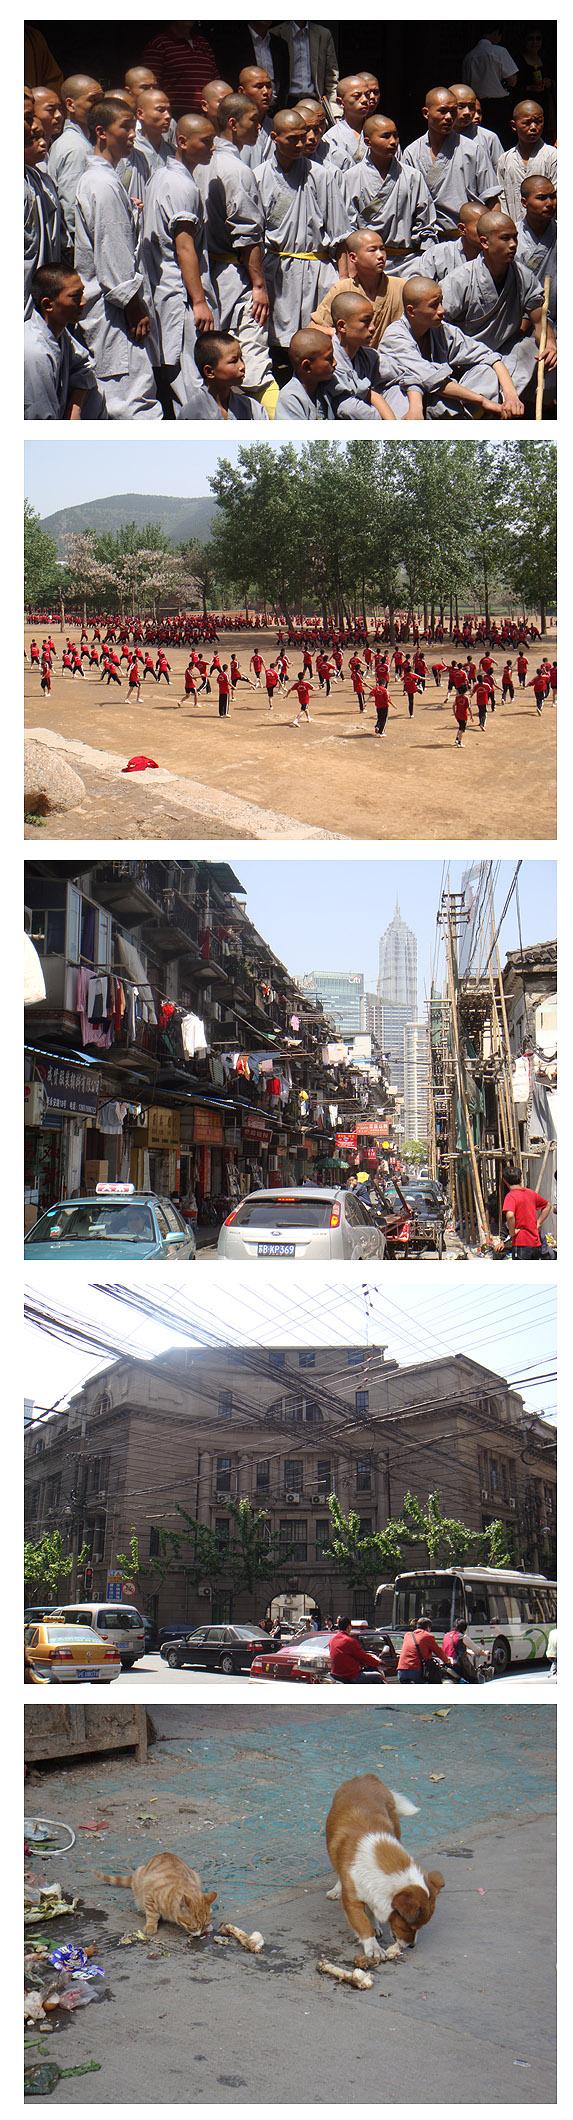 China - photo set 3 by Hideyoshi